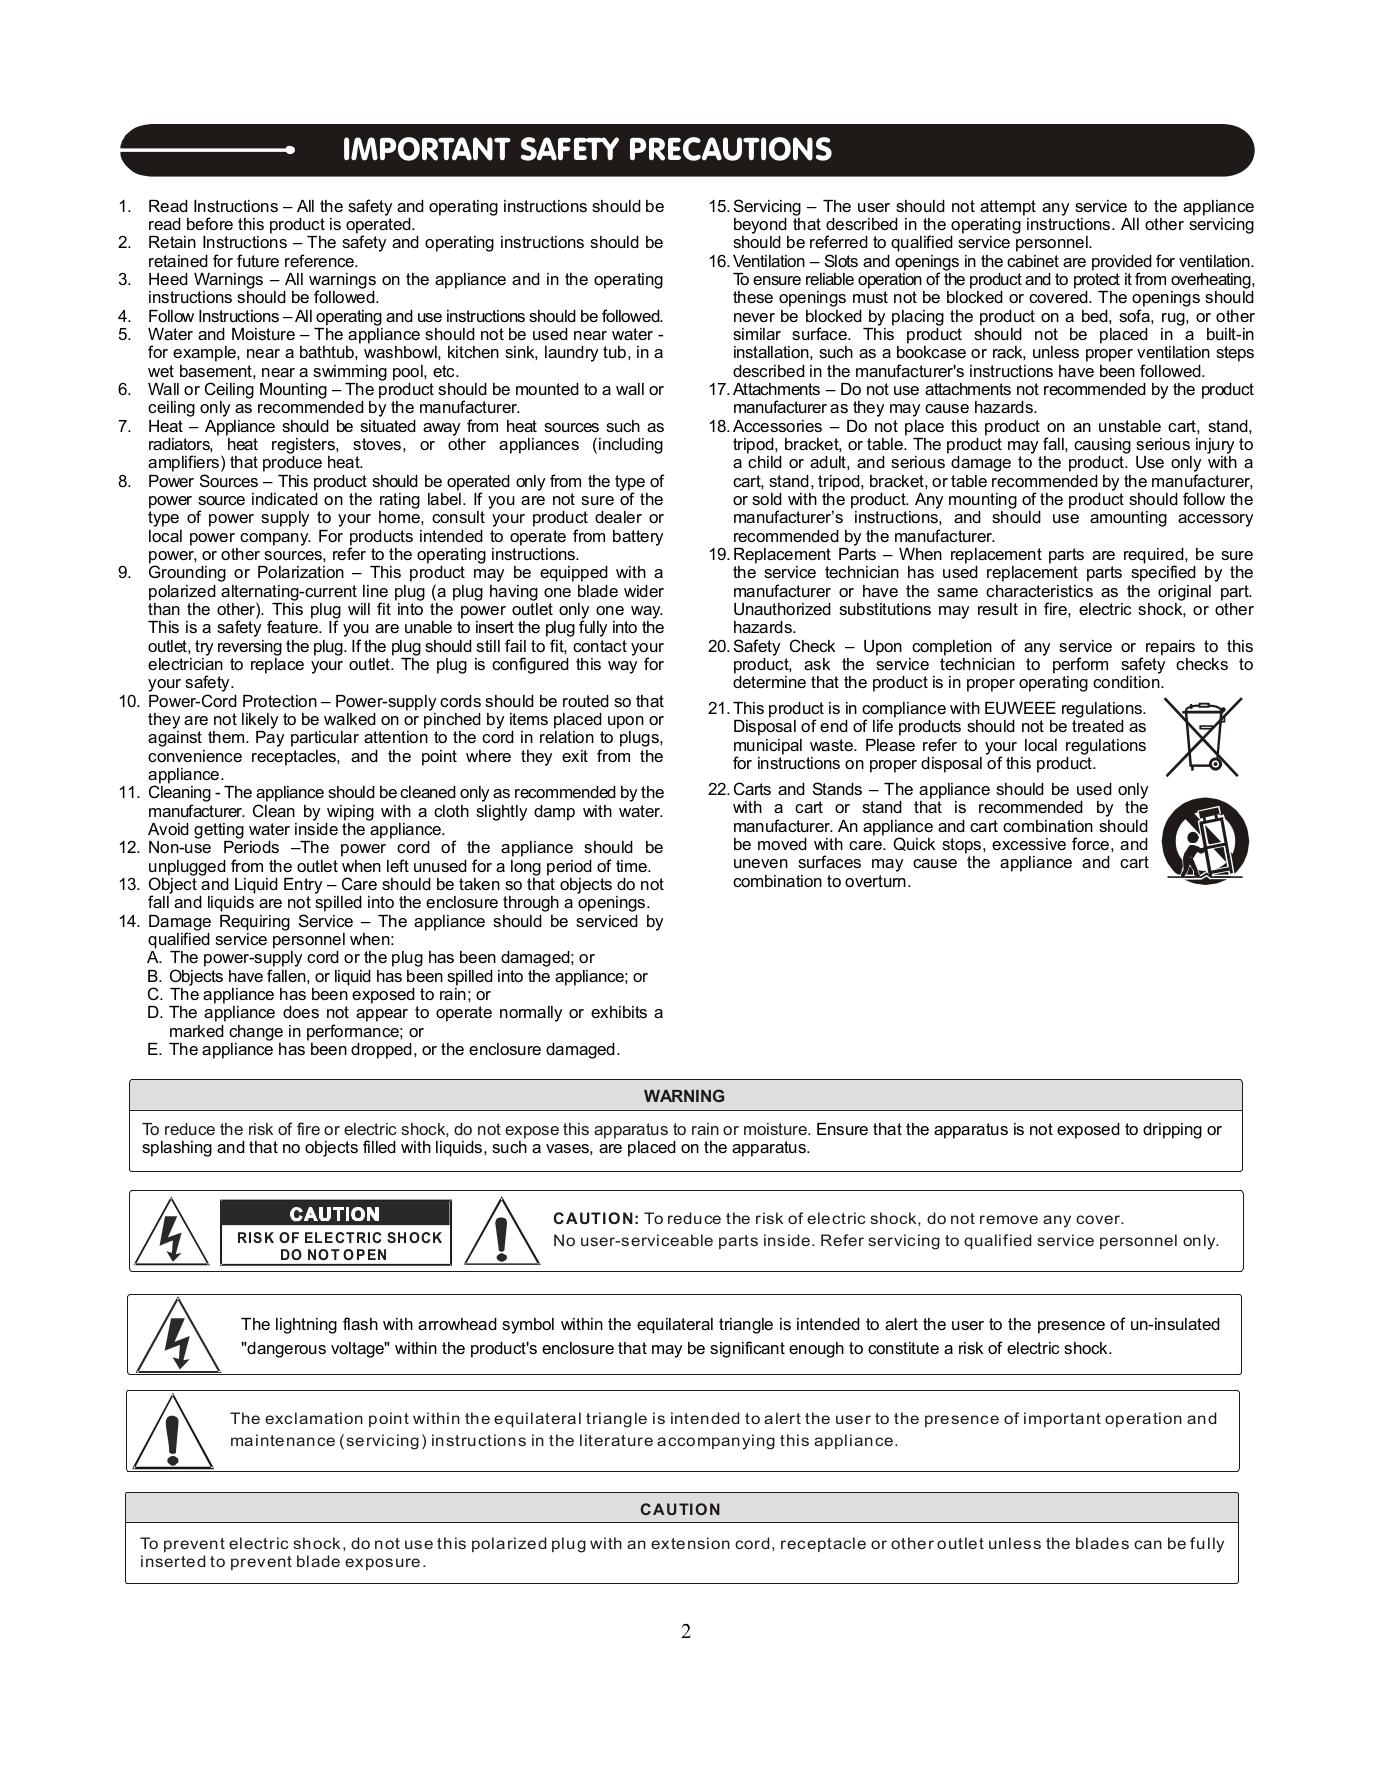 Fantastic Electrical Ic Symbols Pdf Illustration - Electrical and ...